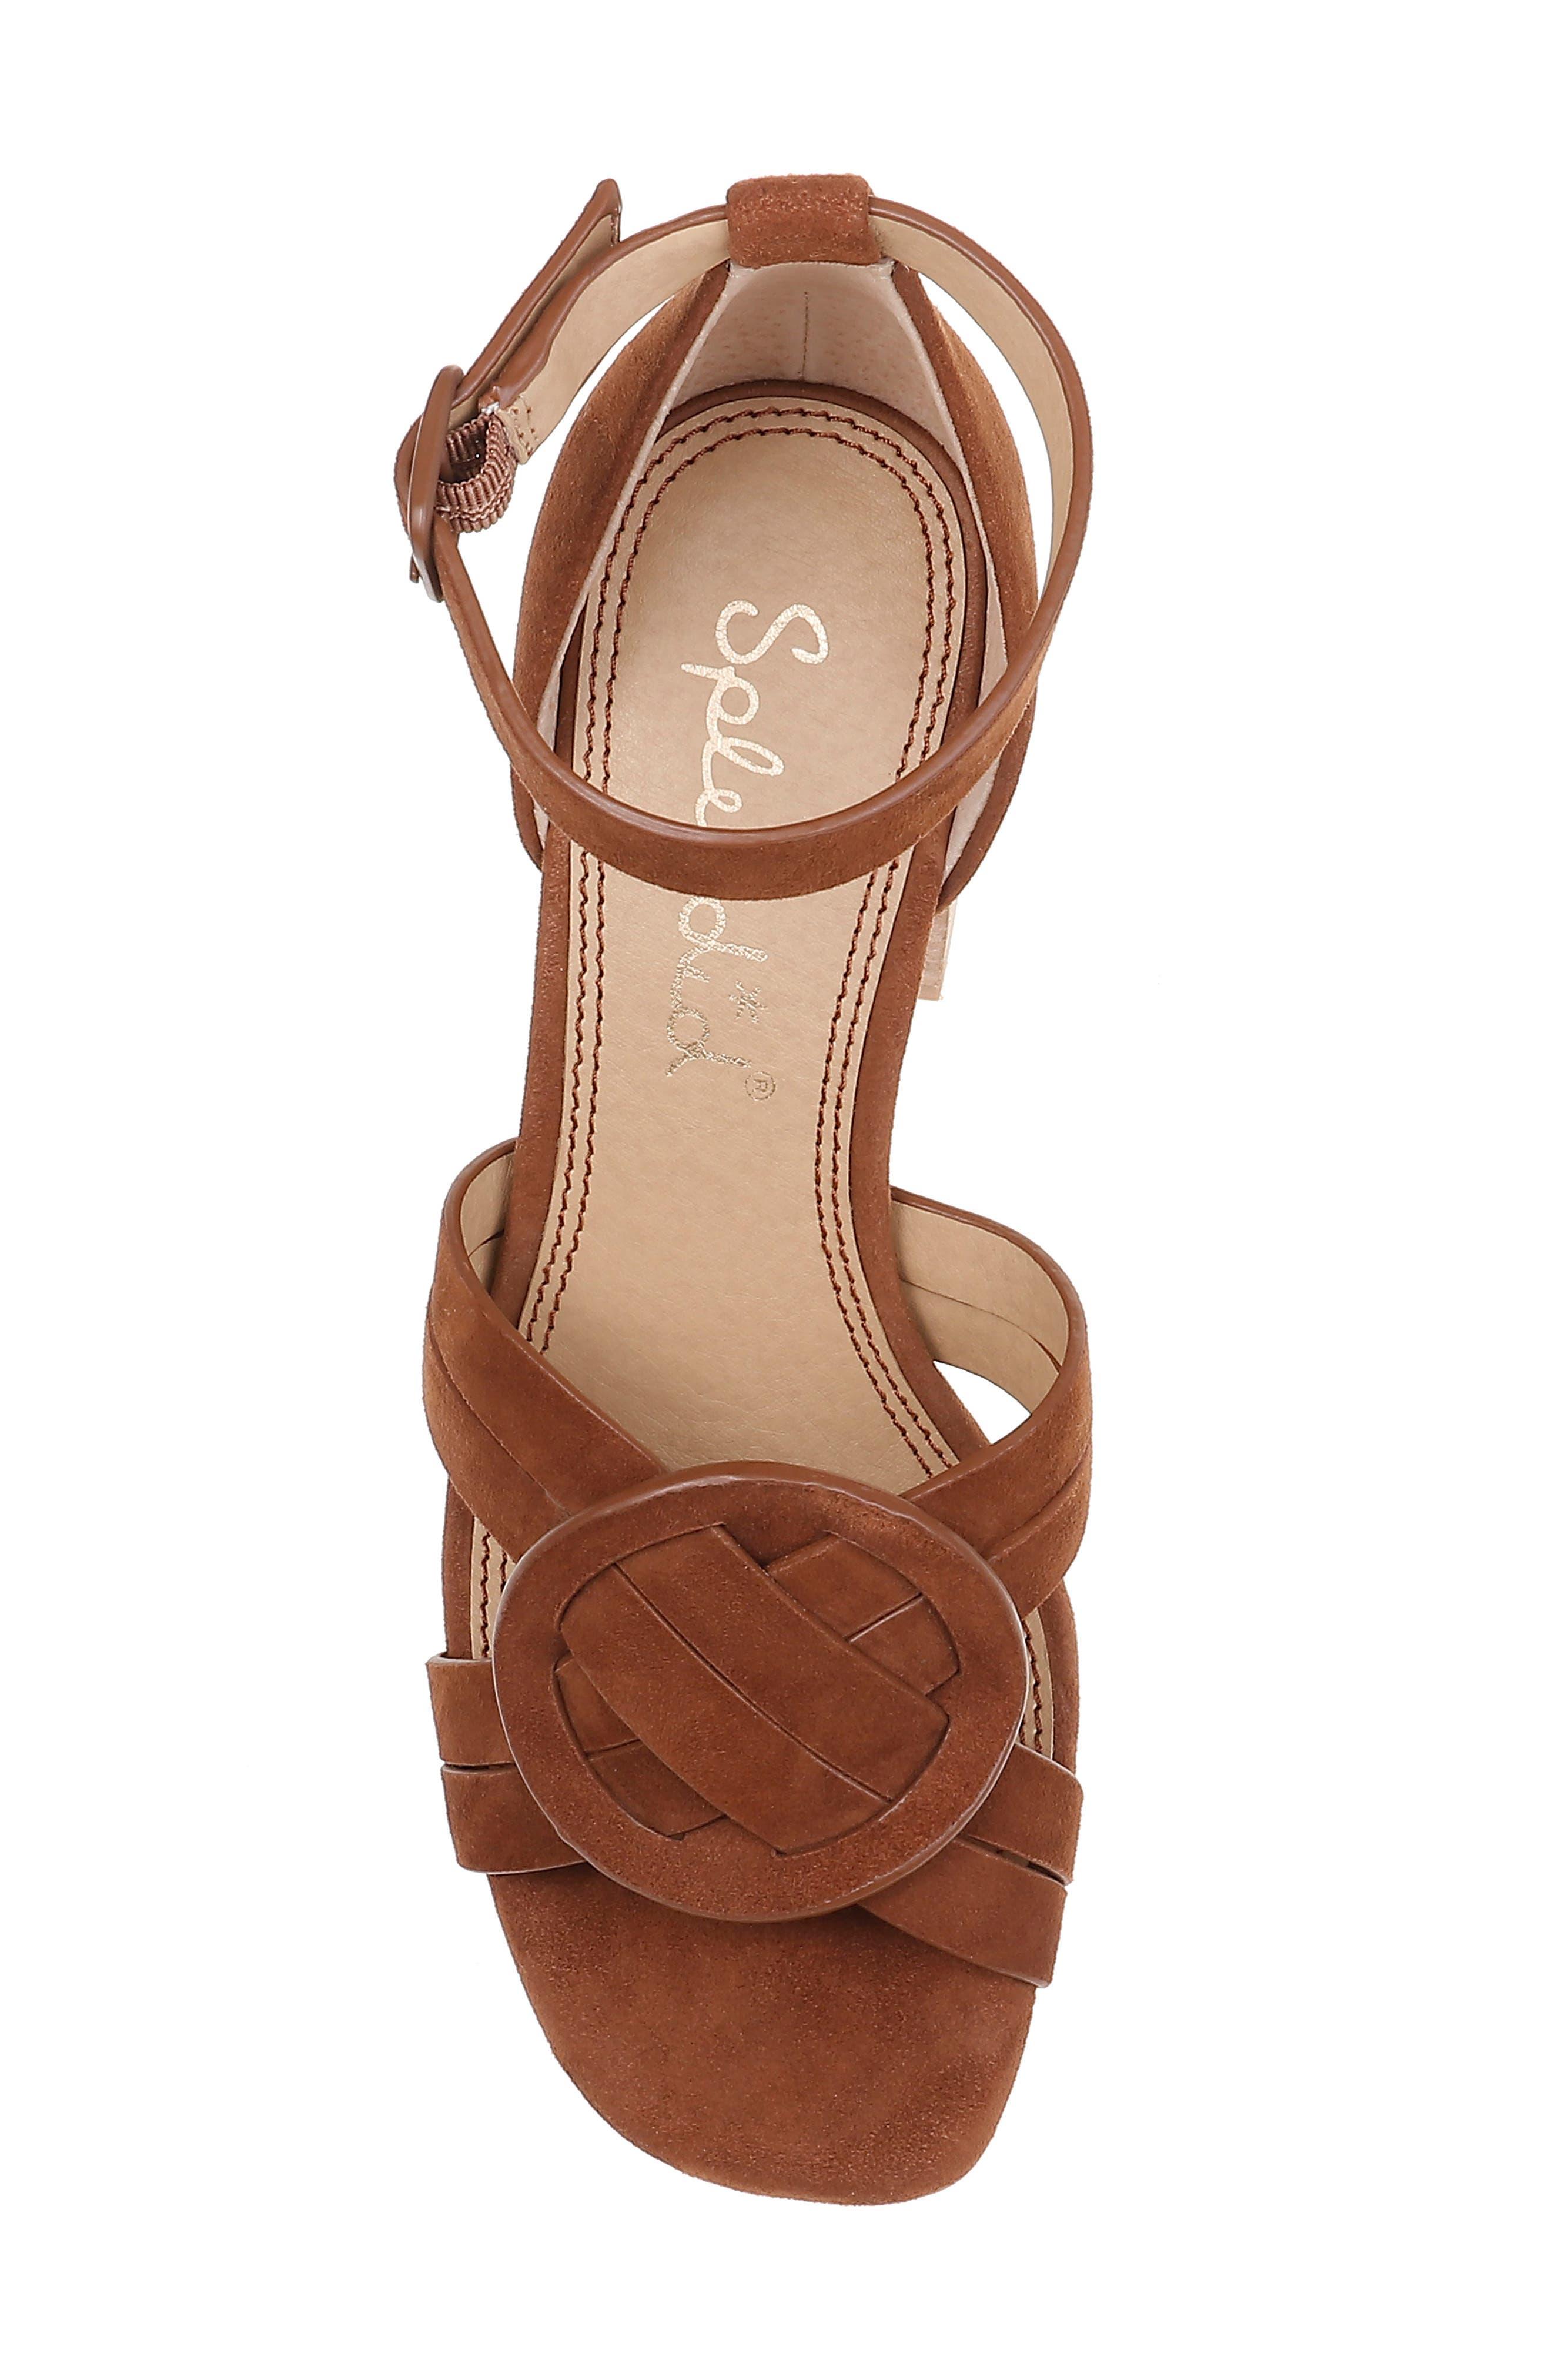 SPLENDID, Tallie Ankle Strap Sandal, Alternate thumbnail 5, color, CHESTNUT SUEDE